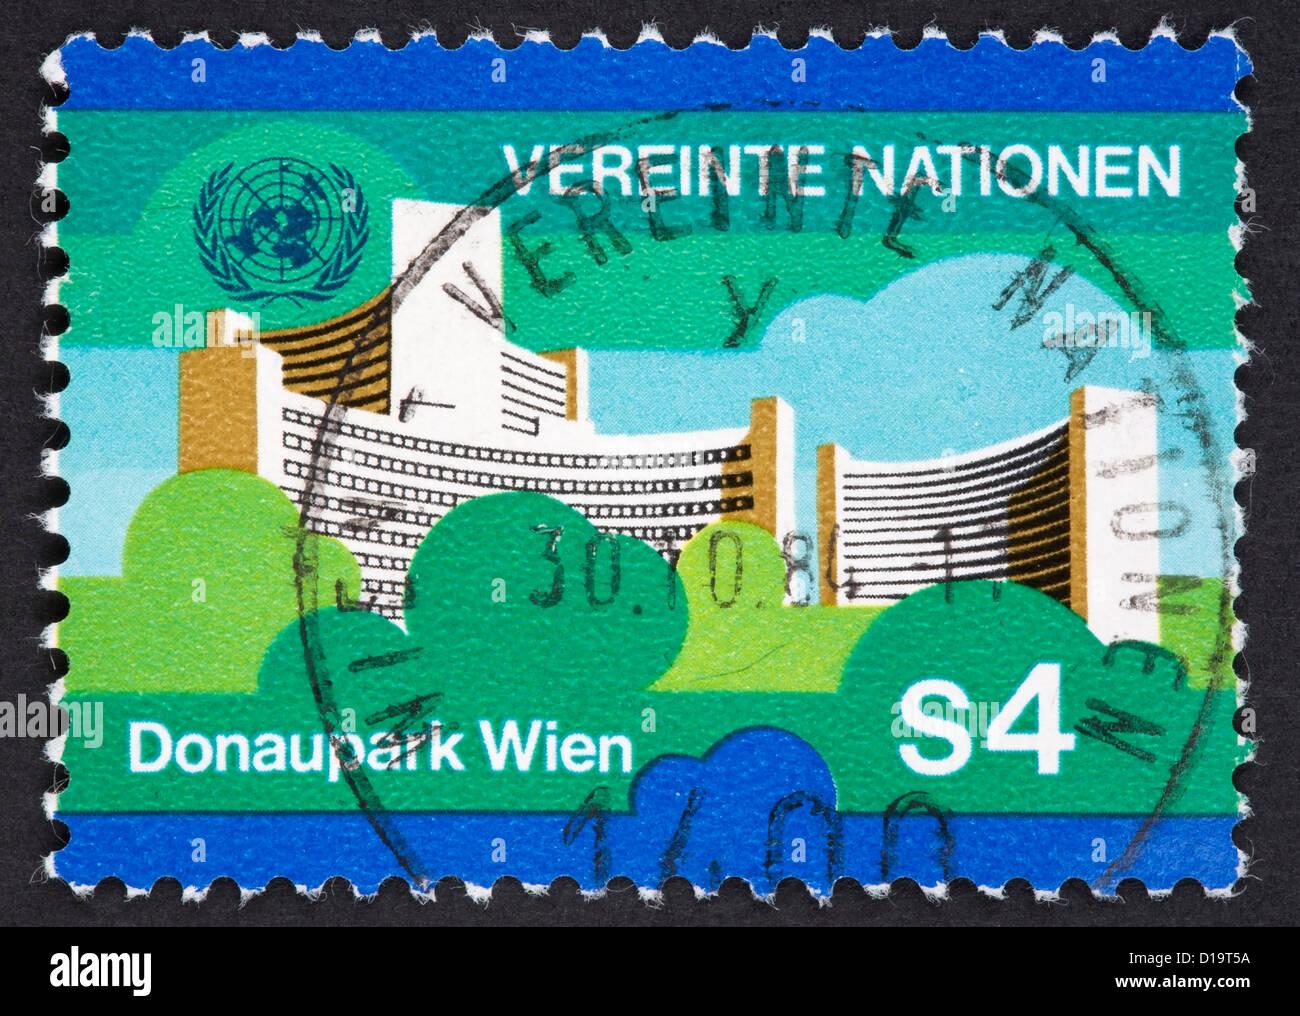 UN postage stamp - Stock Image